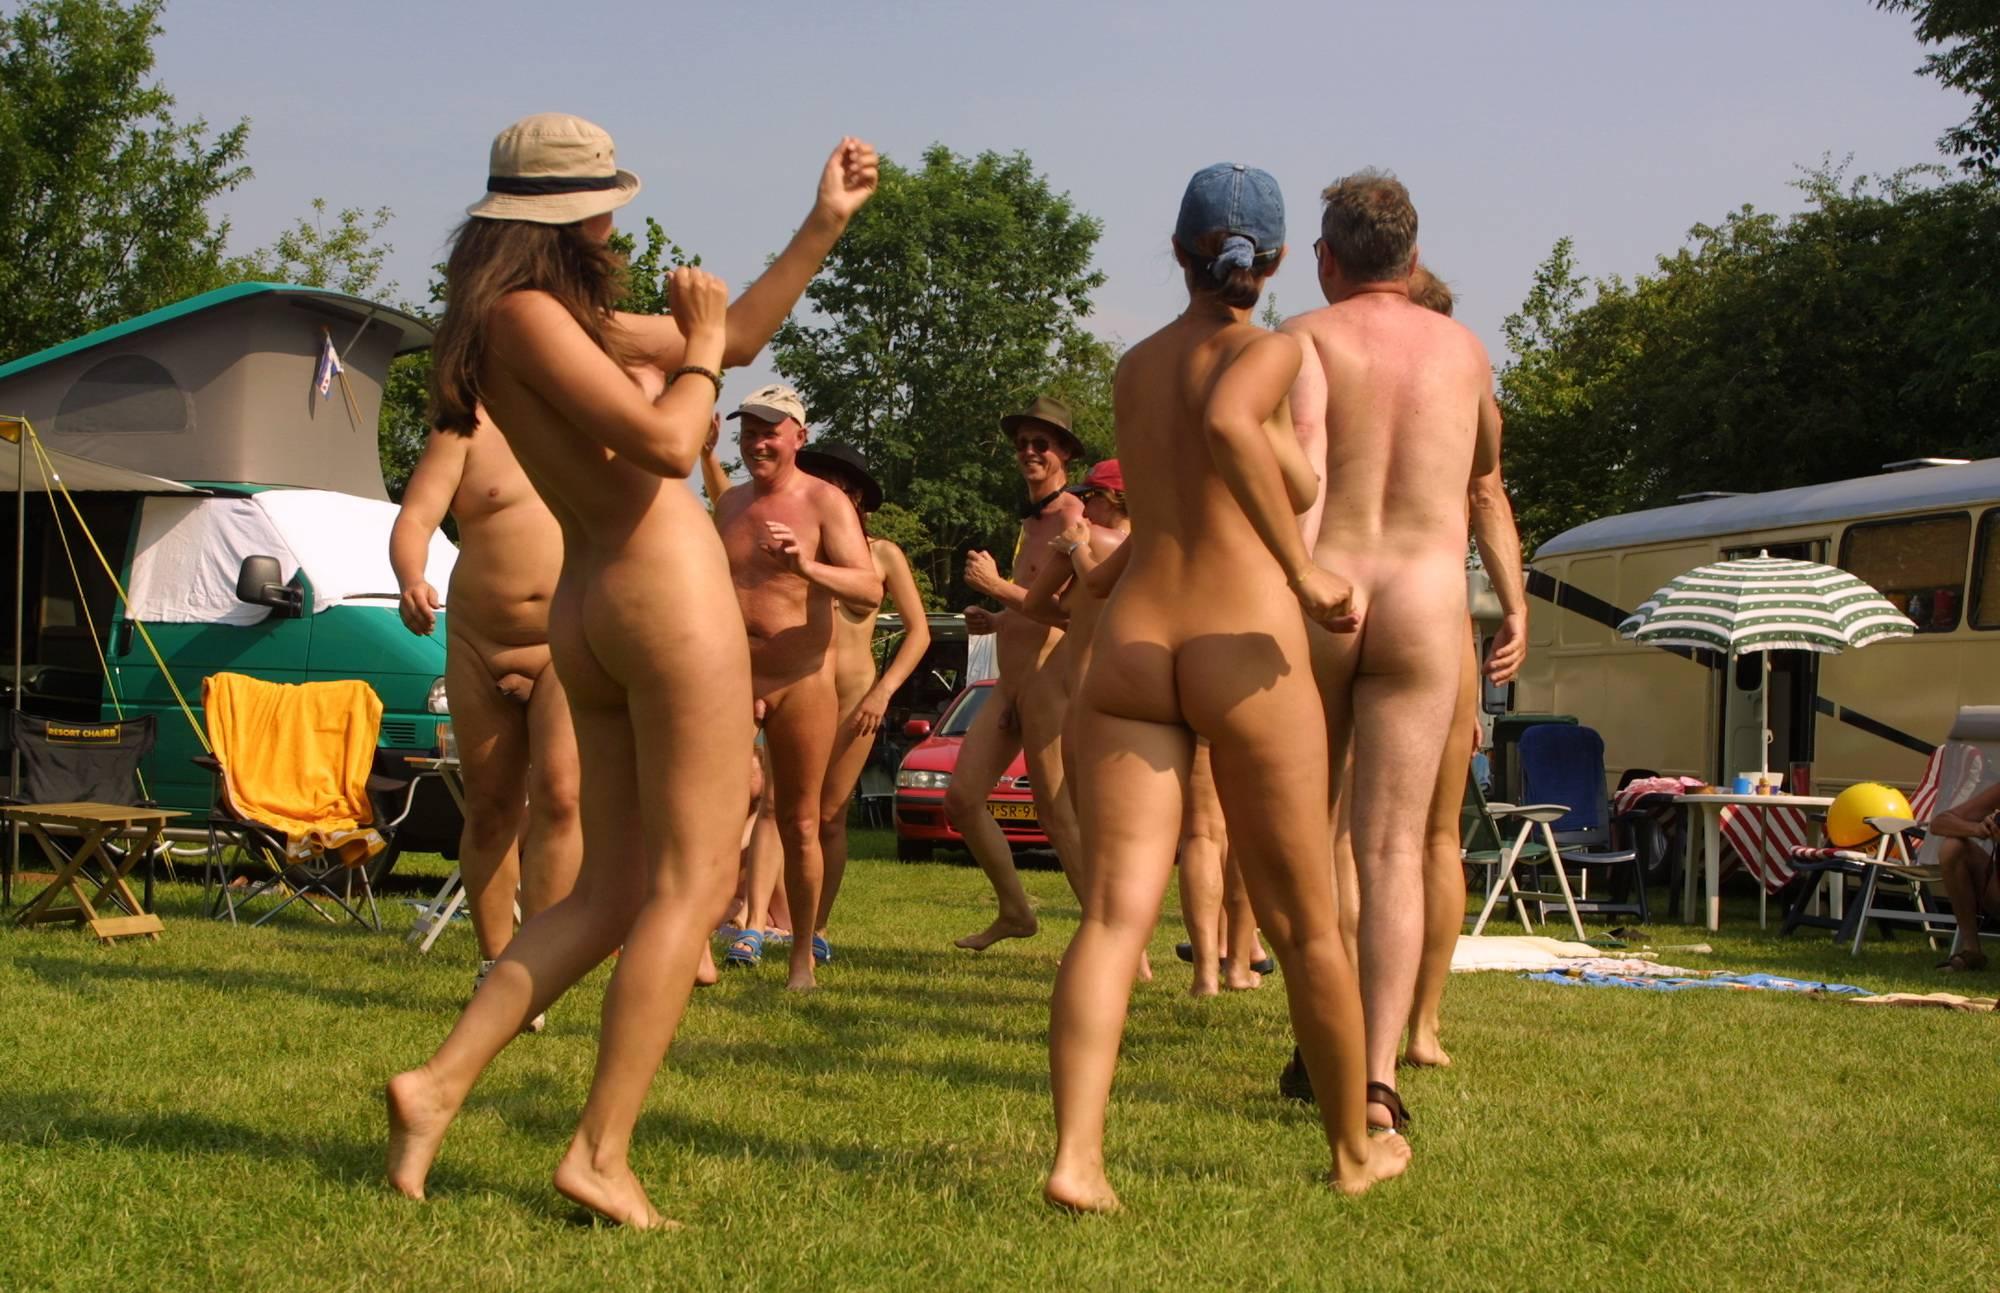 Nudist Pics Holland Nude Group Photo - 2